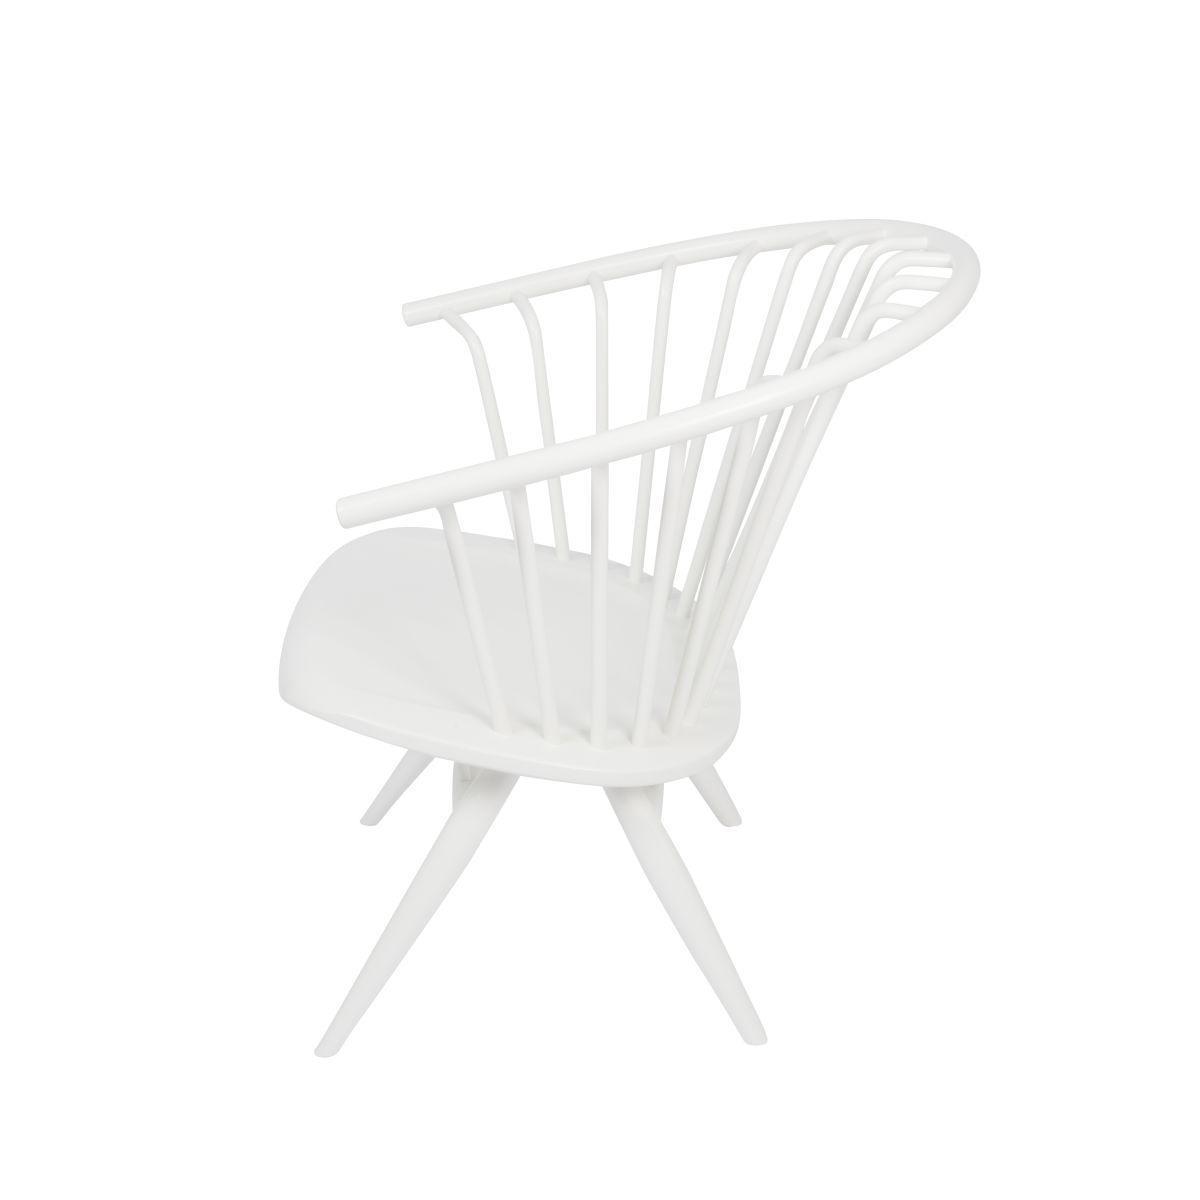 Crinolette-Armchair-White-Lacquer-1844438